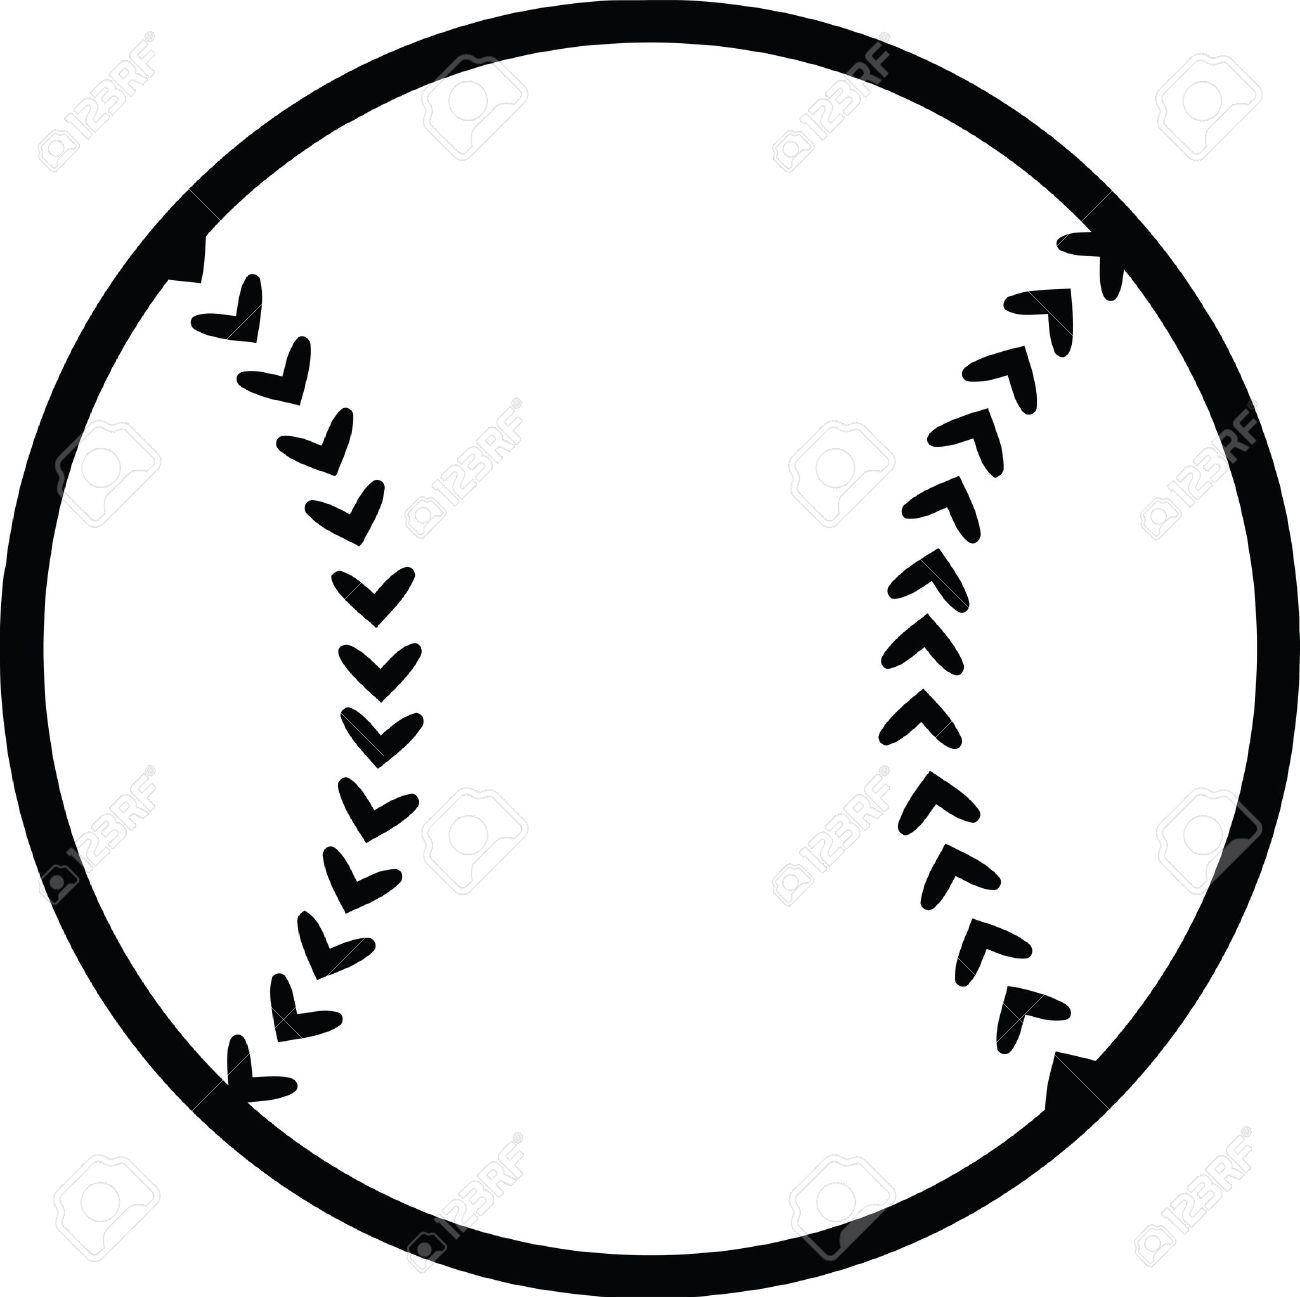 Black and White Baseball Ball Illustration Isolated on white.